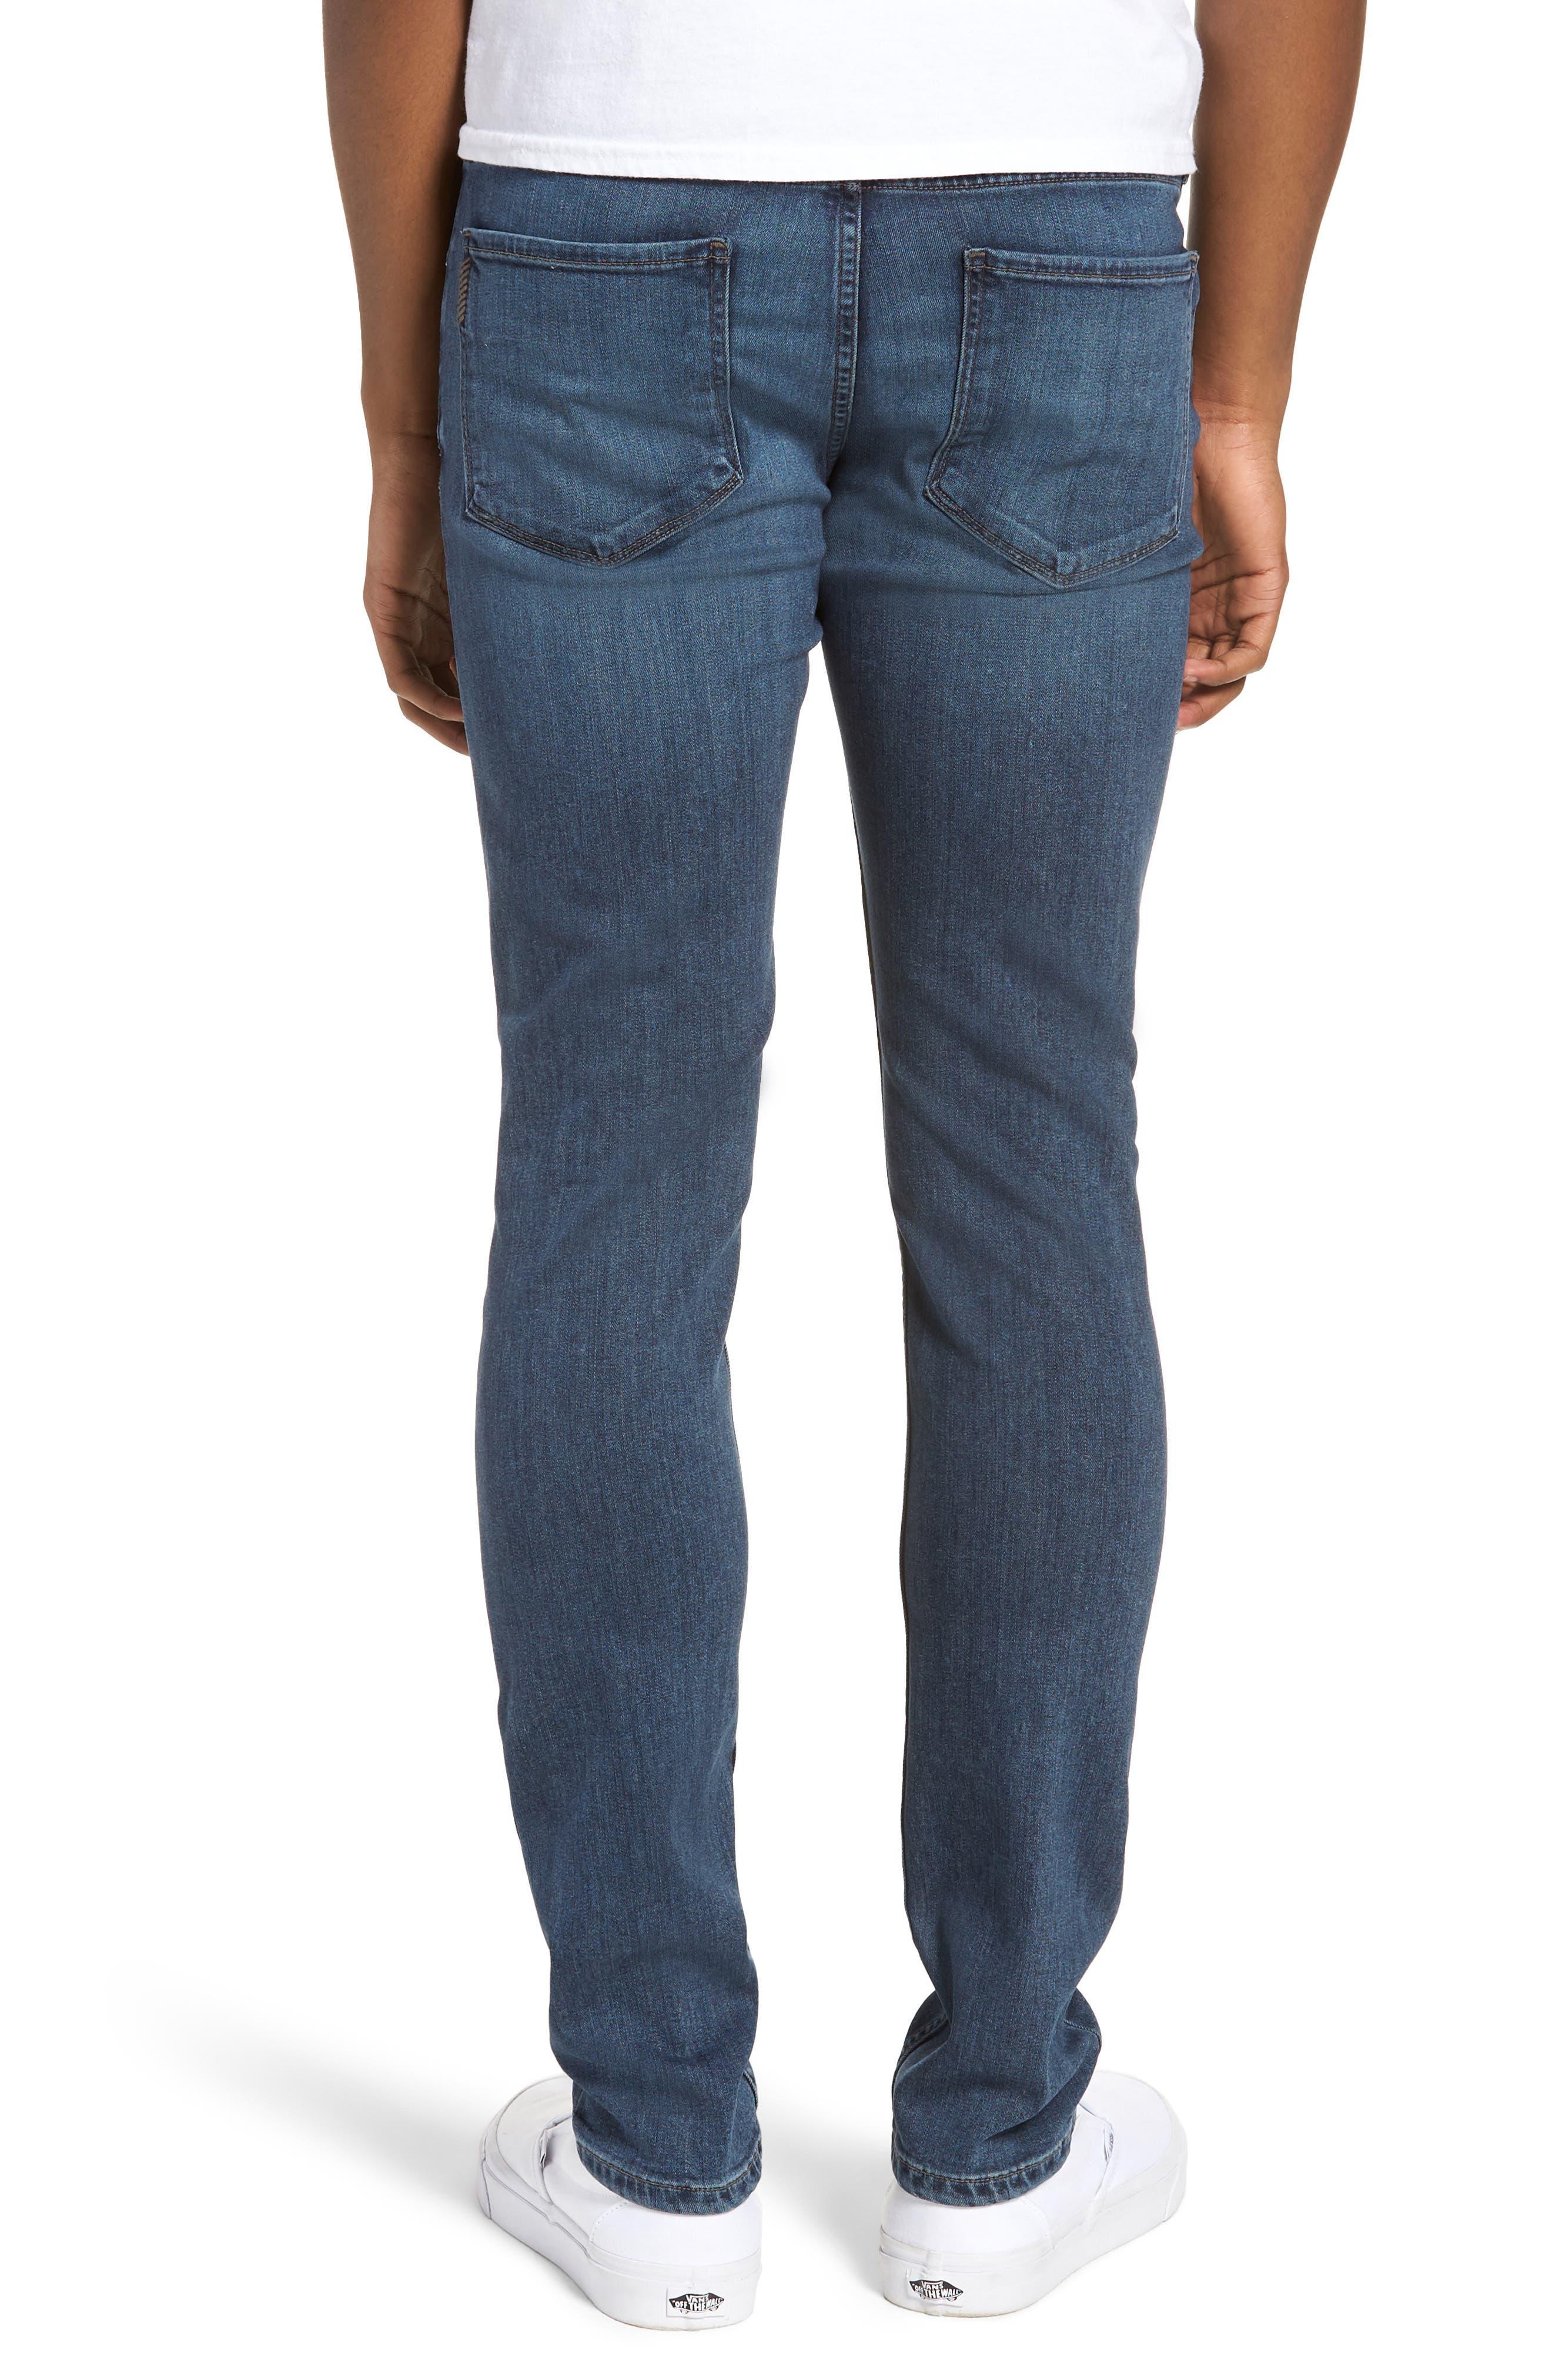 Transcend - Croft Skinny Fit Jeans,                             Alternate thumbnail 2, color,                             GRAMMERCY